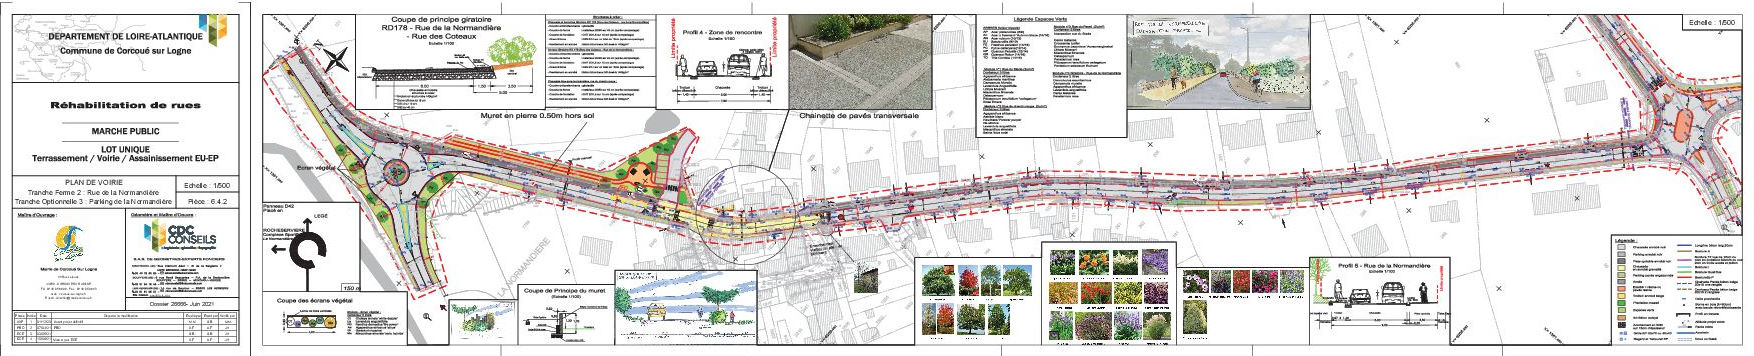 26666- Piece 6.4.2 - Plan de Voirie-TF2-Rue de la Normandiere.jpg